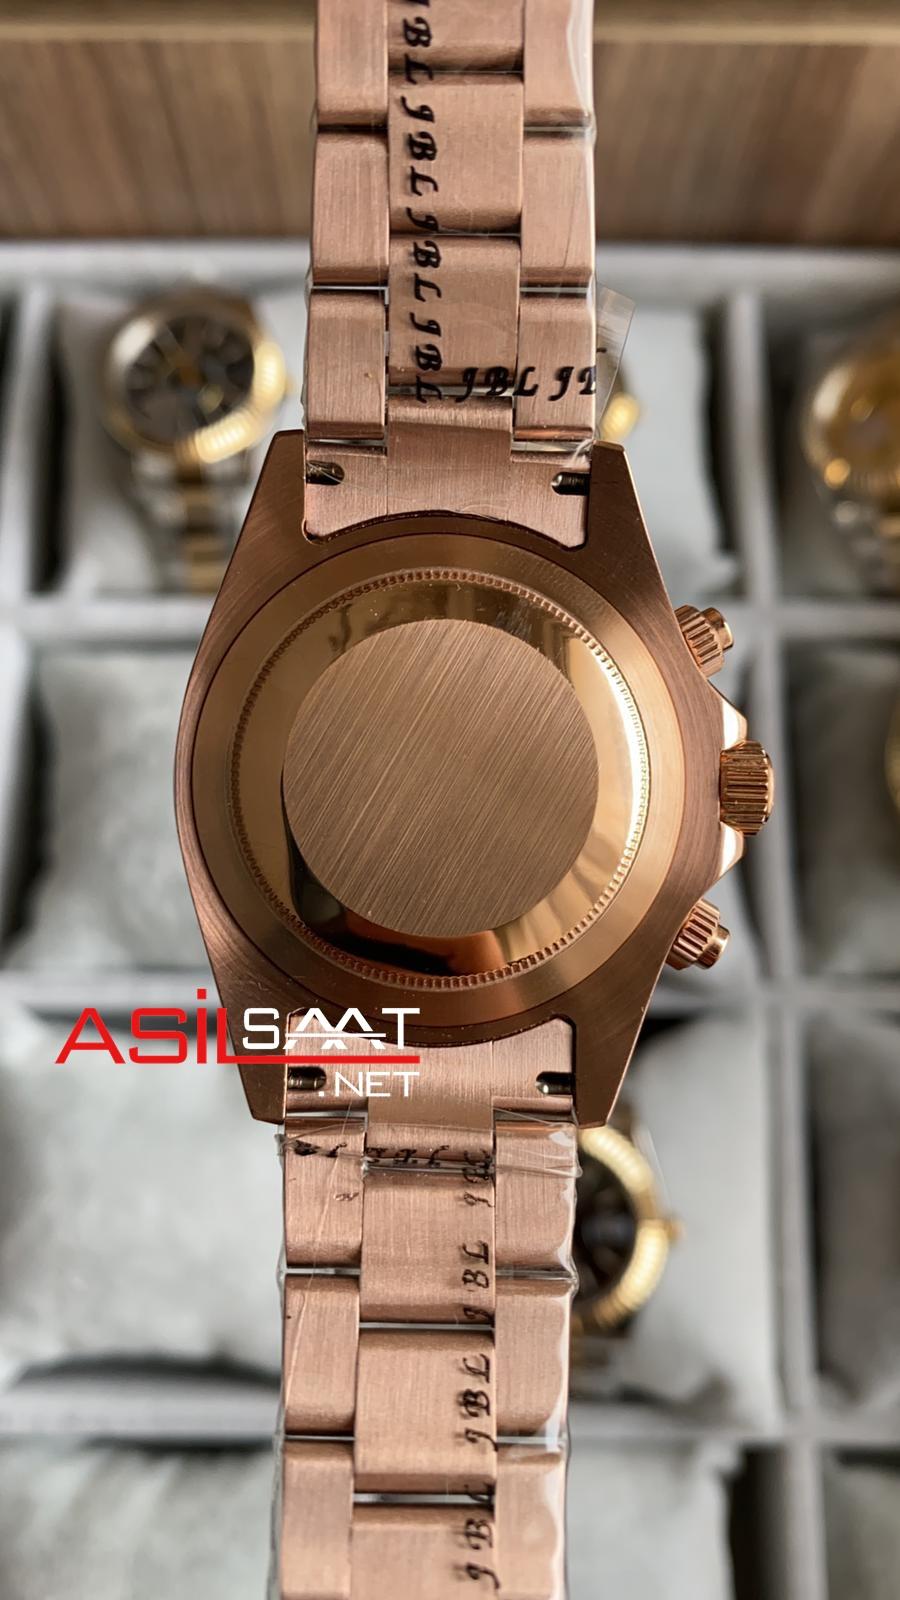 Rolex Oyster Perpetual Cosmograph Daytona Rosegold Replika Saat ROLD024